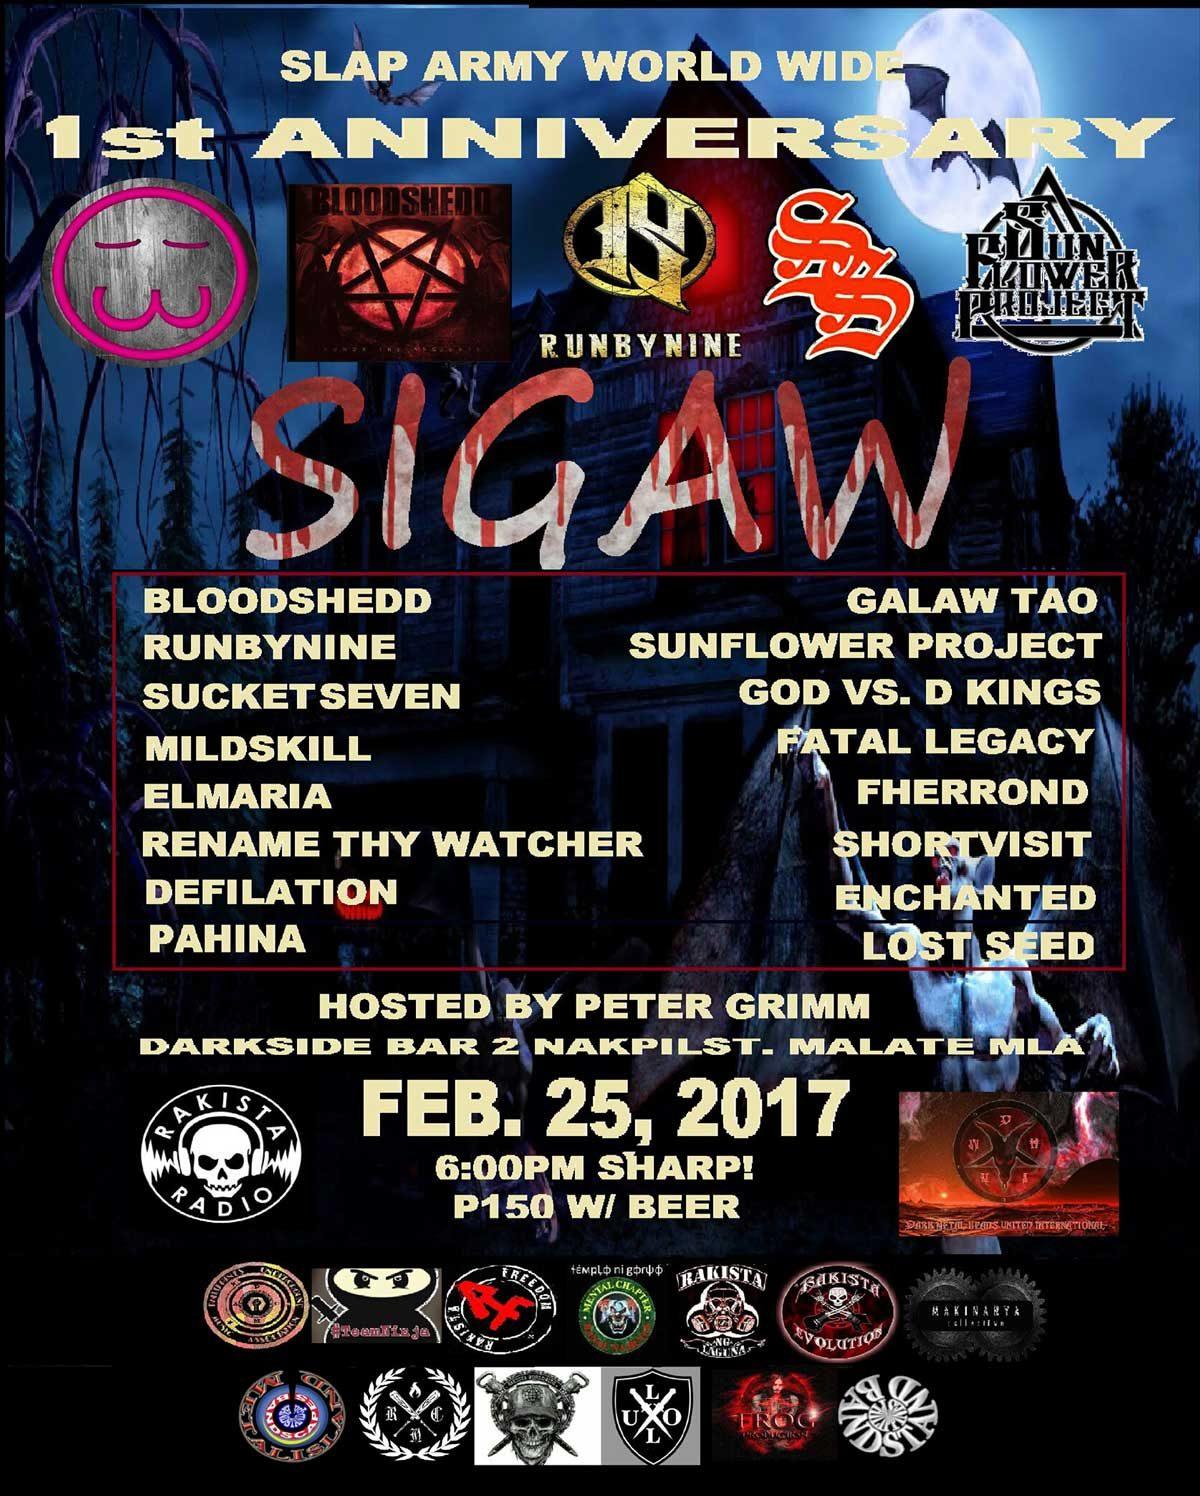 Slaparmy Worldwide 1st Anniversary